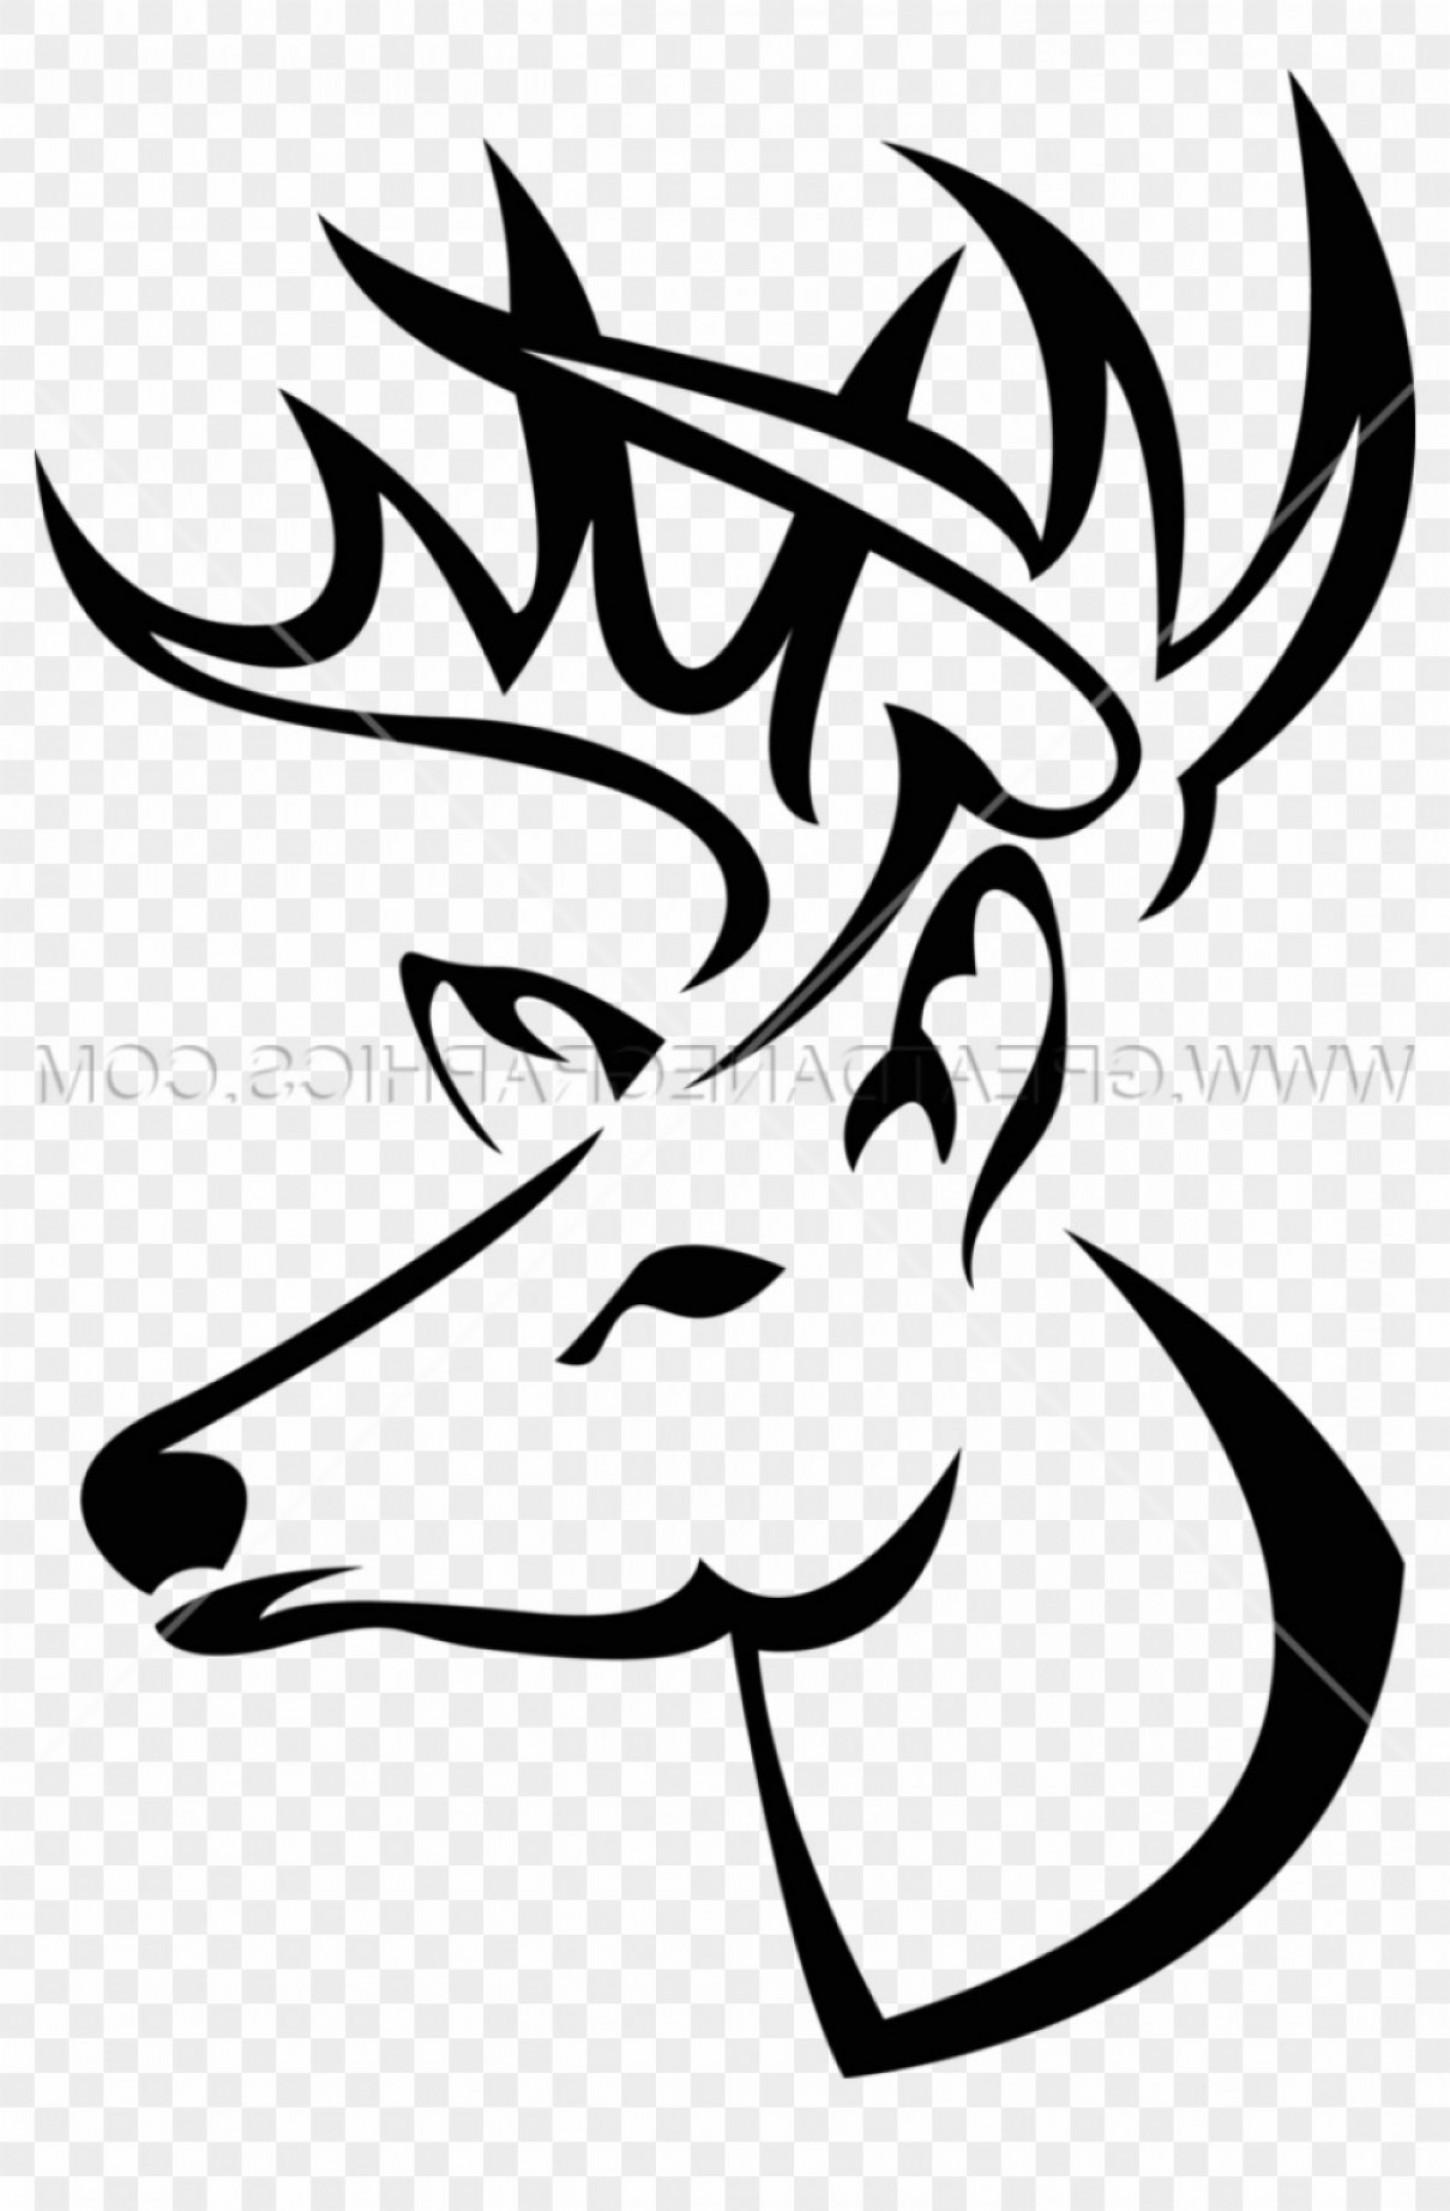 png library stock Miadbmbadeer art download buck. Drumsticks vector skull.